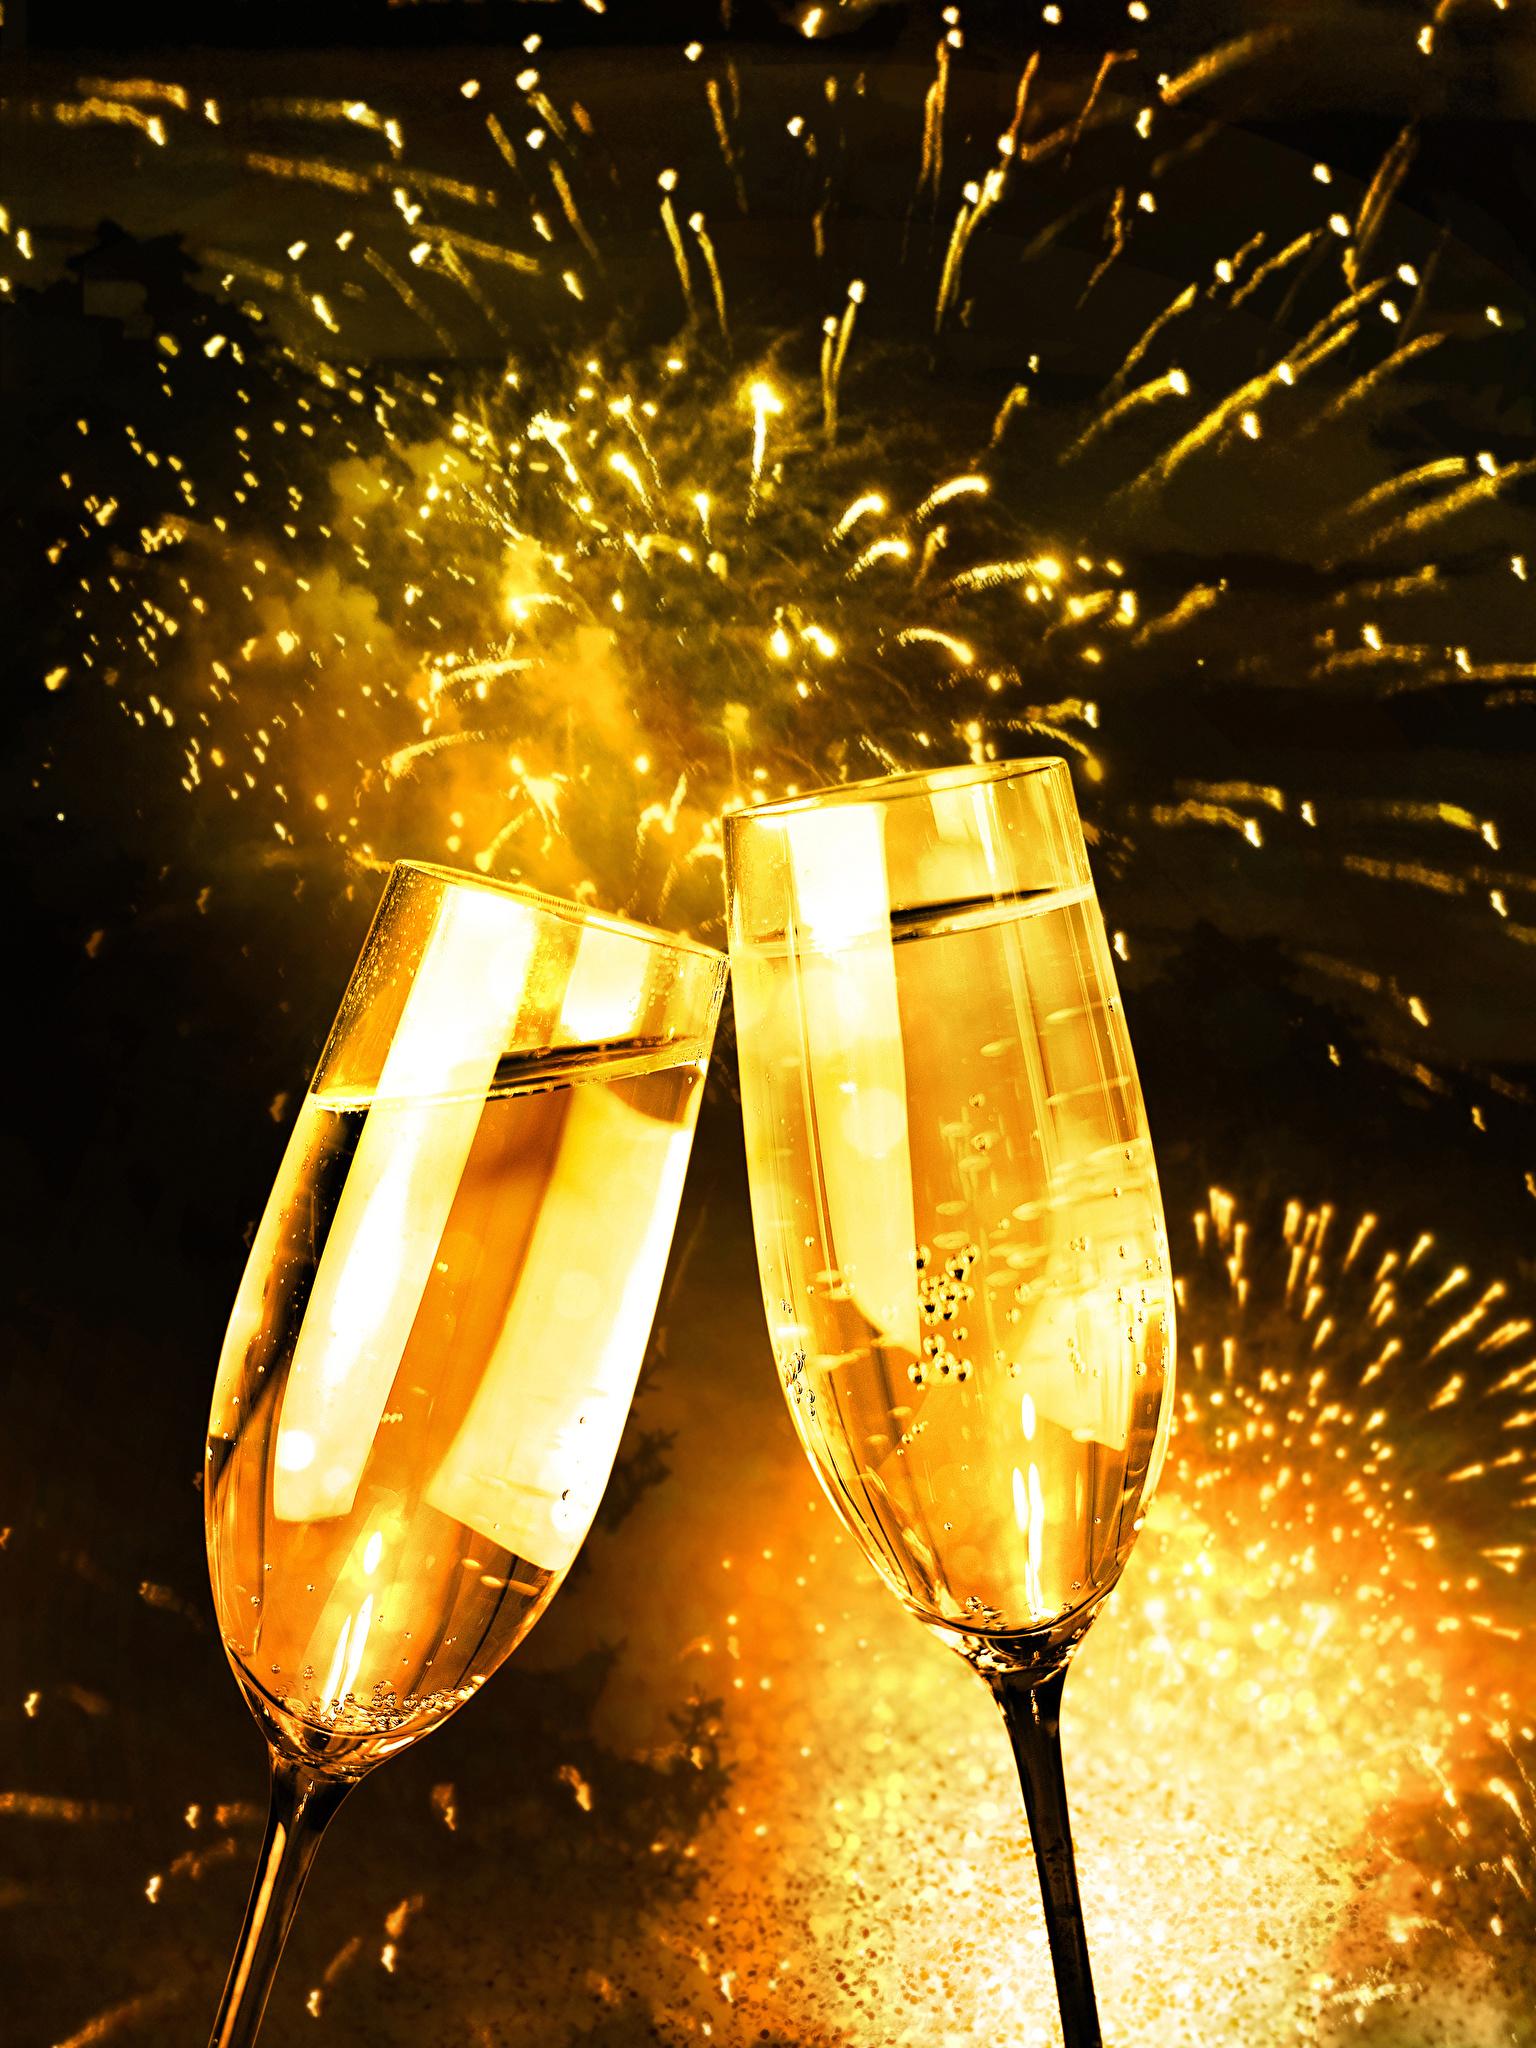 Christmas_Fireworks_Champagne_Stemware_Two_538621_1536x2048.jpg